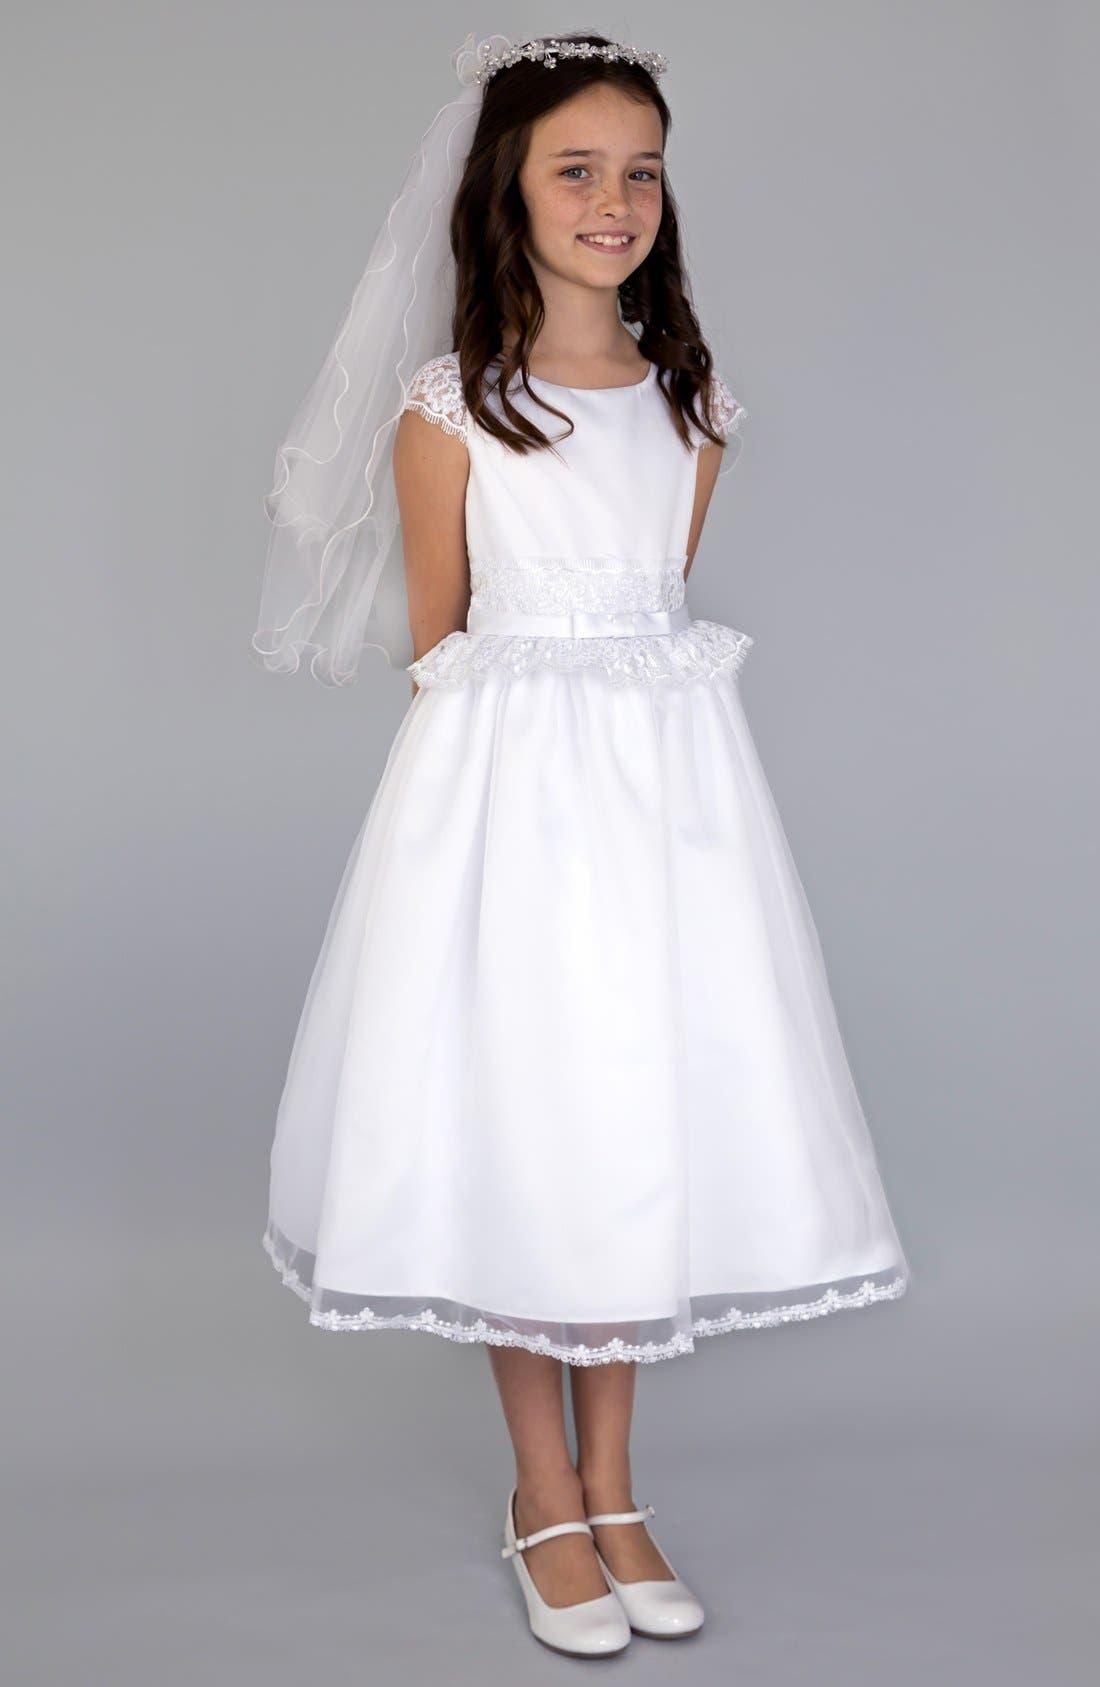 Us Angels Lace Peplum Organza Dress (Little Girls, Big Girls & Girls' Plus)